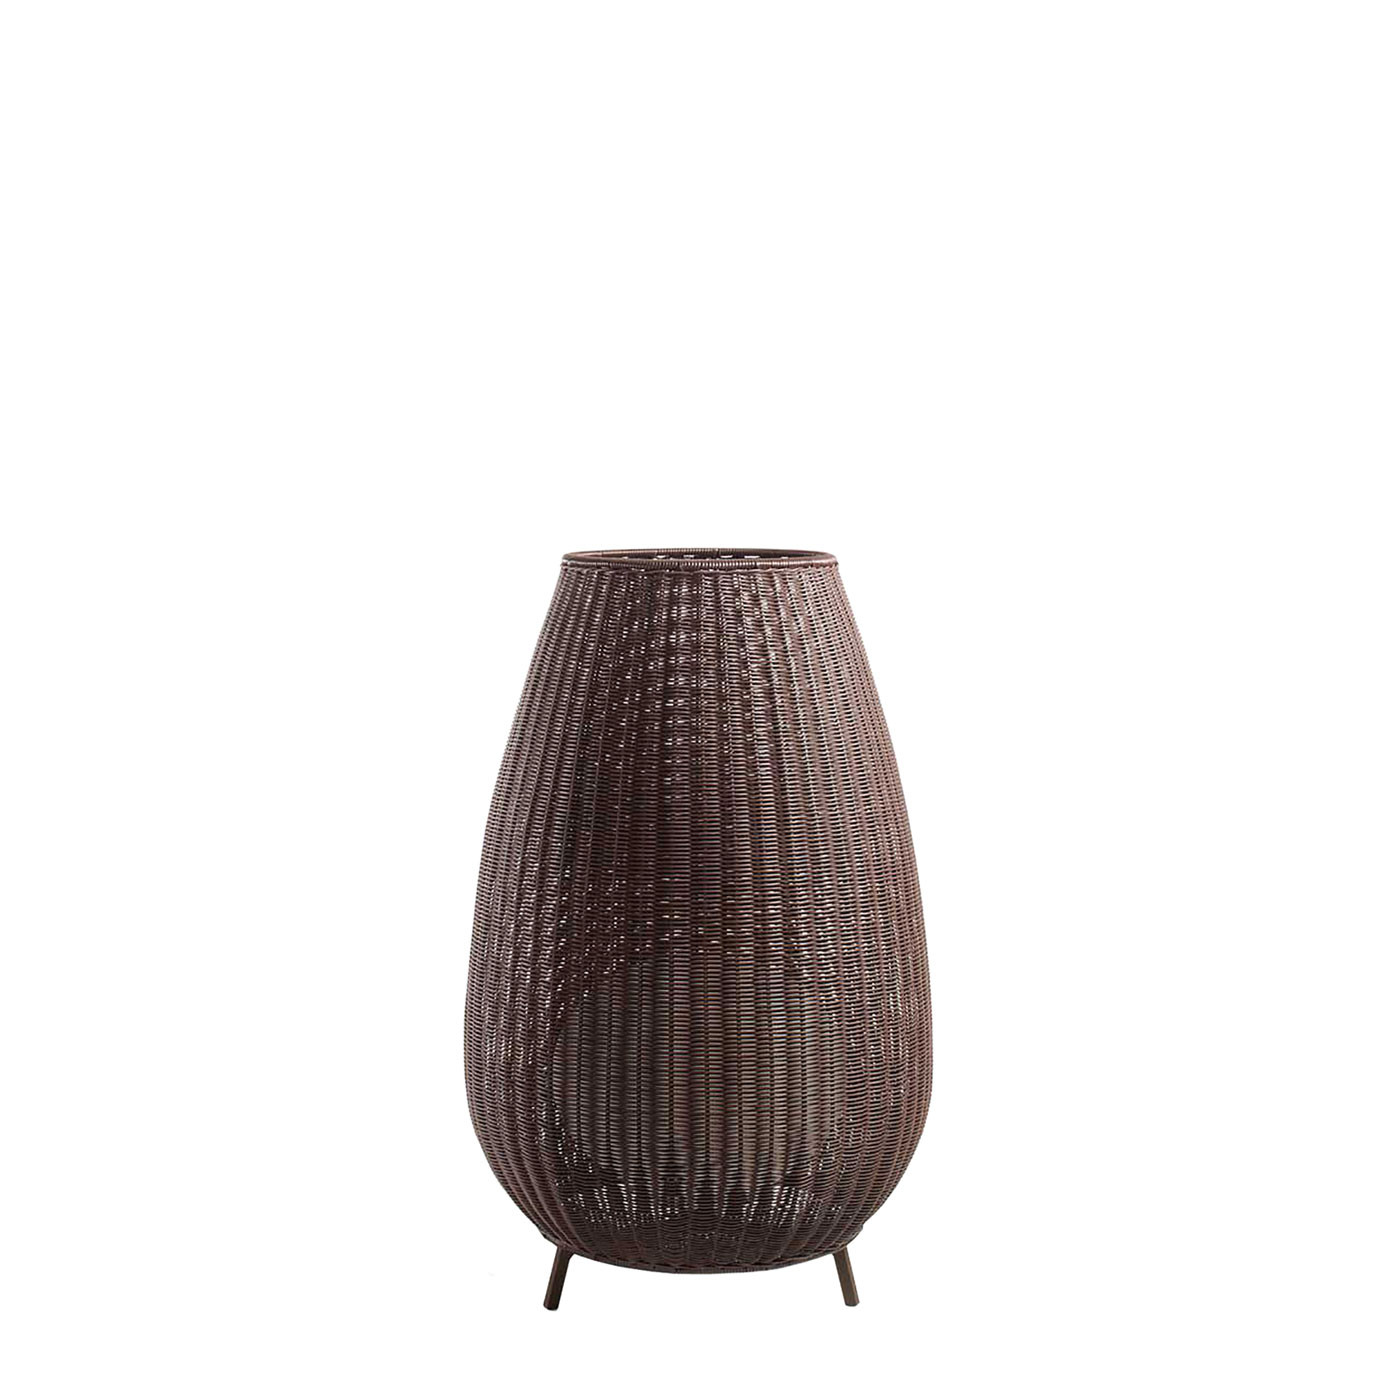 Bover Amphora Outdoor